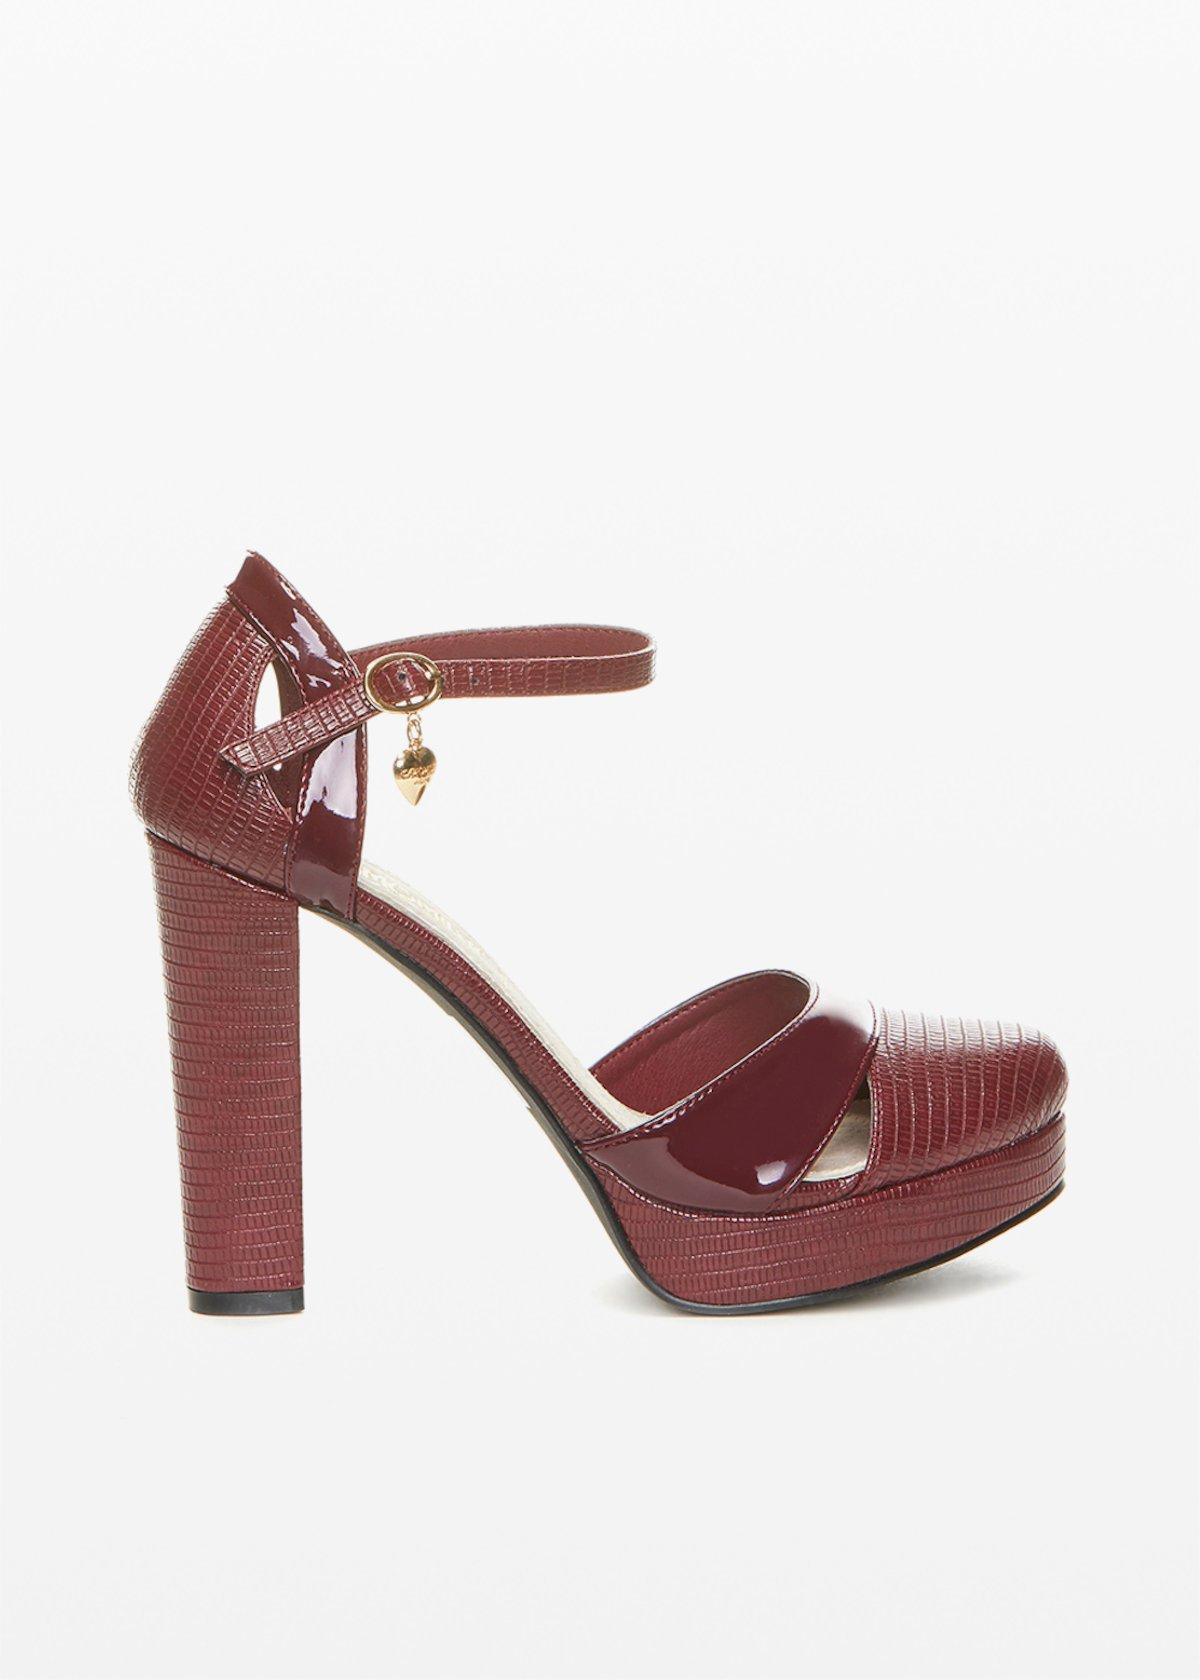 Patent Sophie sandal python effect - Morello - Woman - Category image